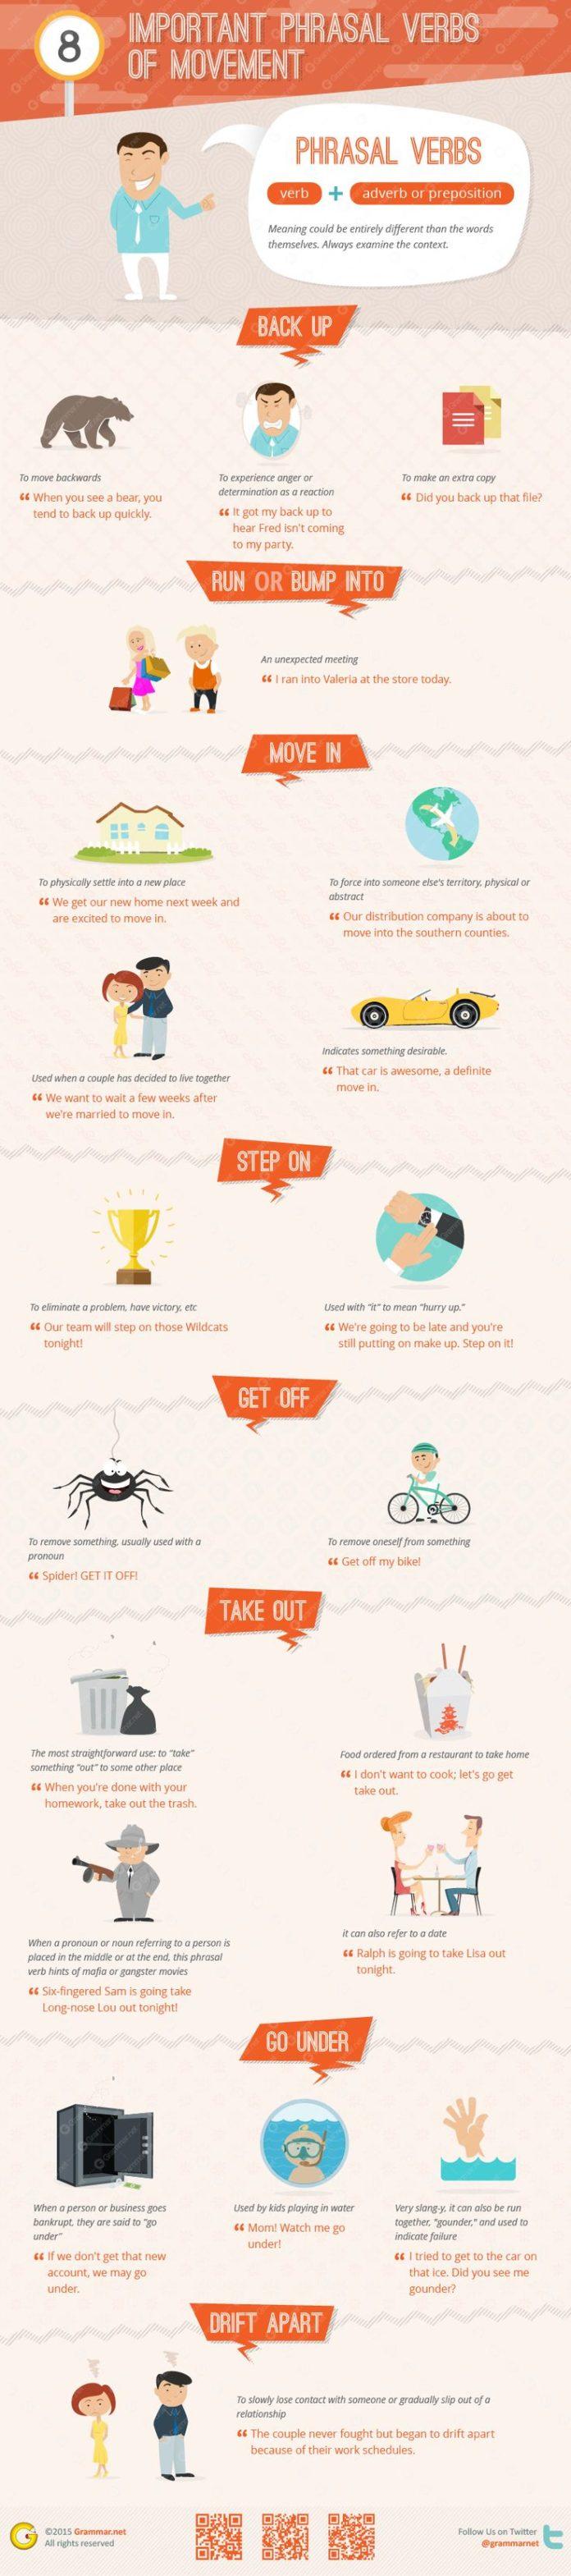 Infographic powerpoints on grammar